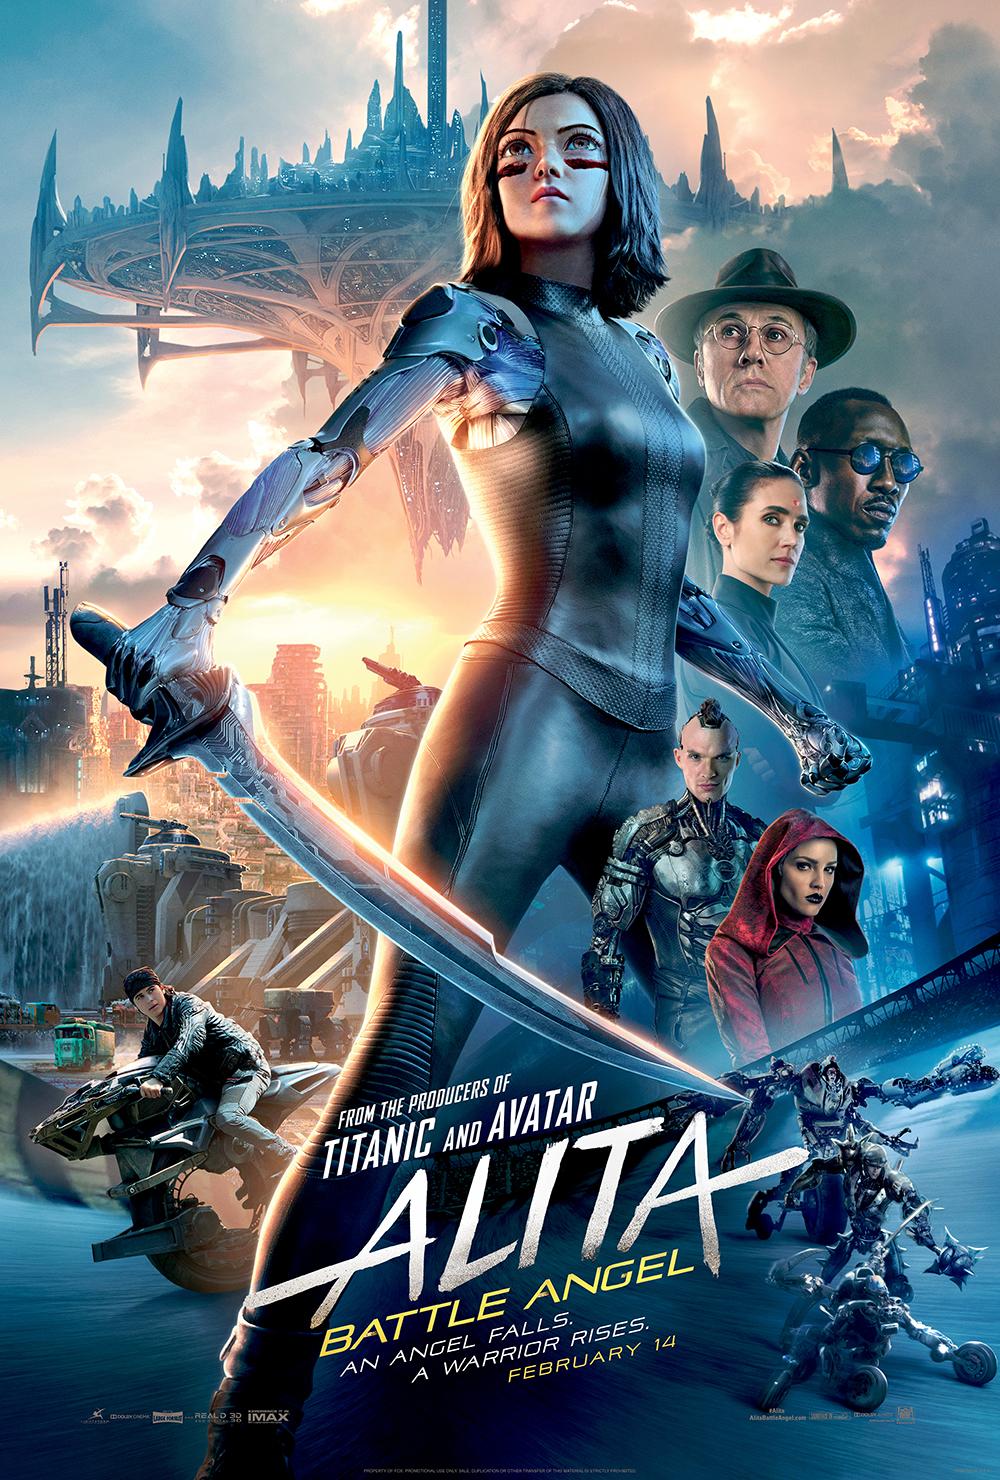 alita-battle-angle-3d-3-d-movie-review.jpg